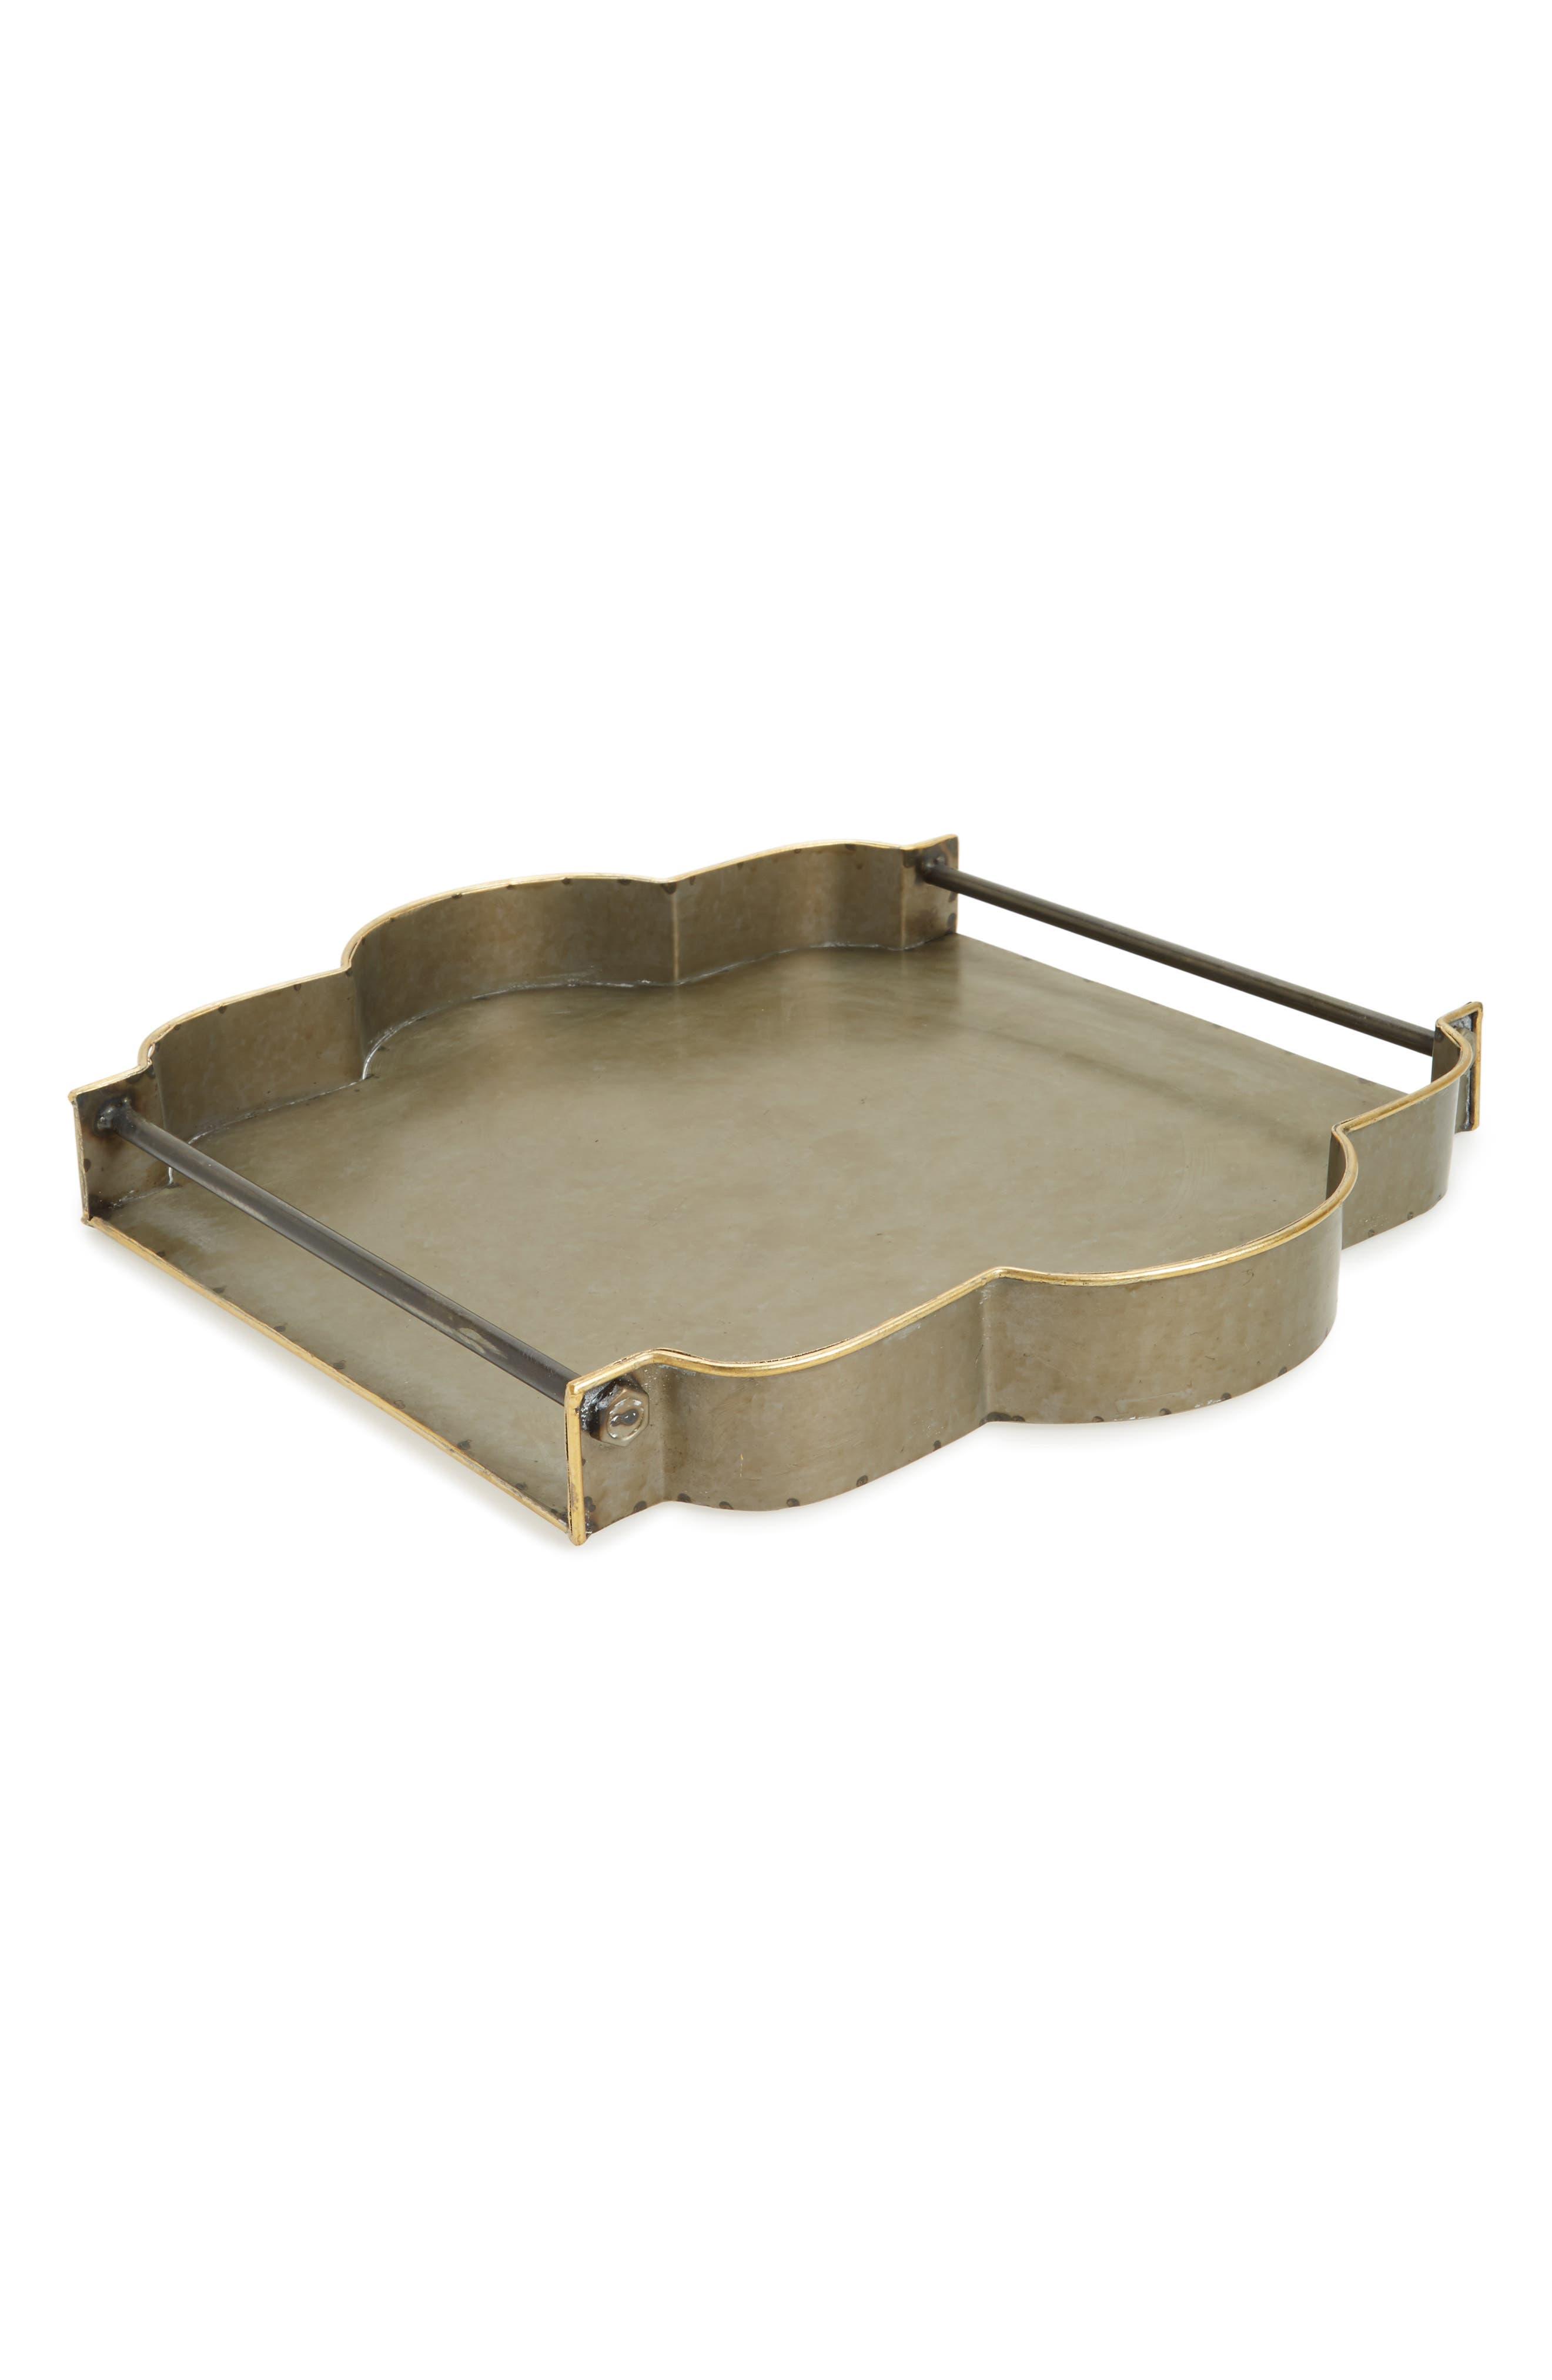 York Galvanized Tray,                         Main,                         color, Galvanized With Gold Rim